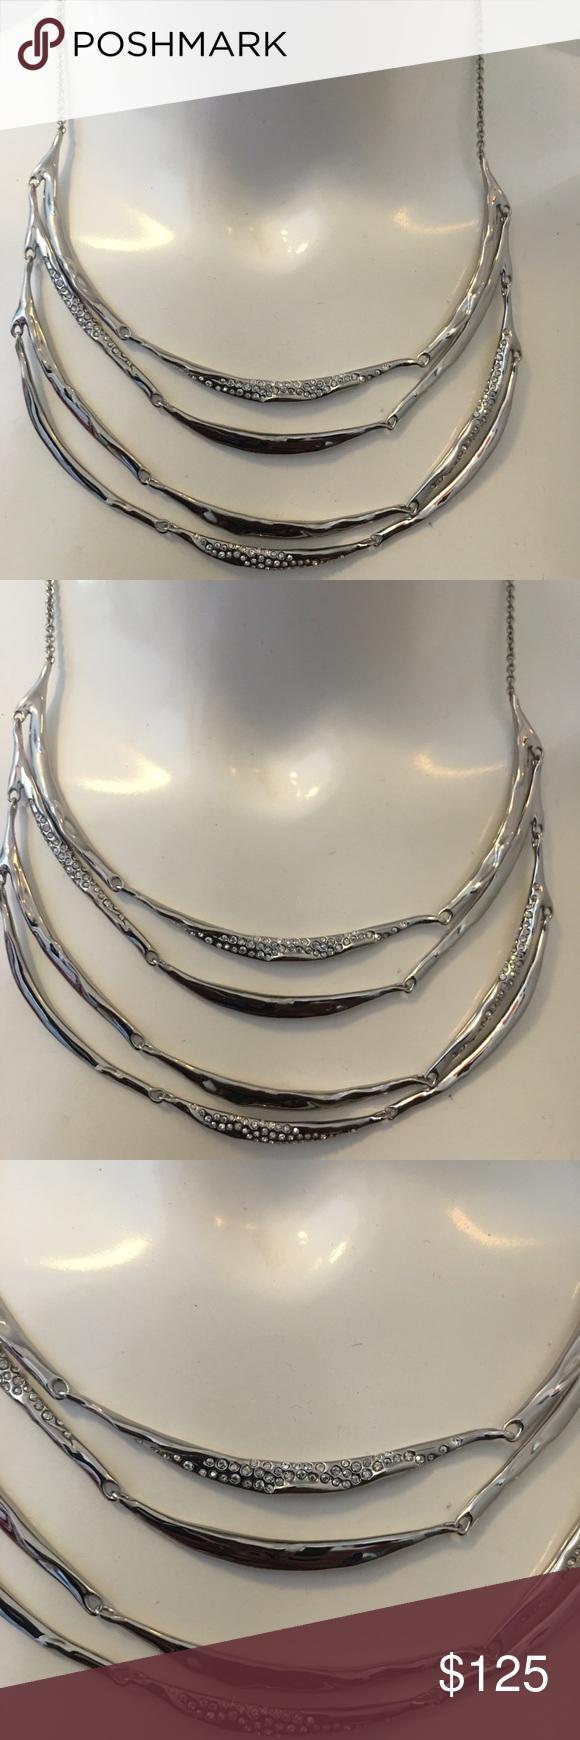 Encrusted drape necklace Encrusted drape necklace Alexis Bittar Jewelry Necklaces